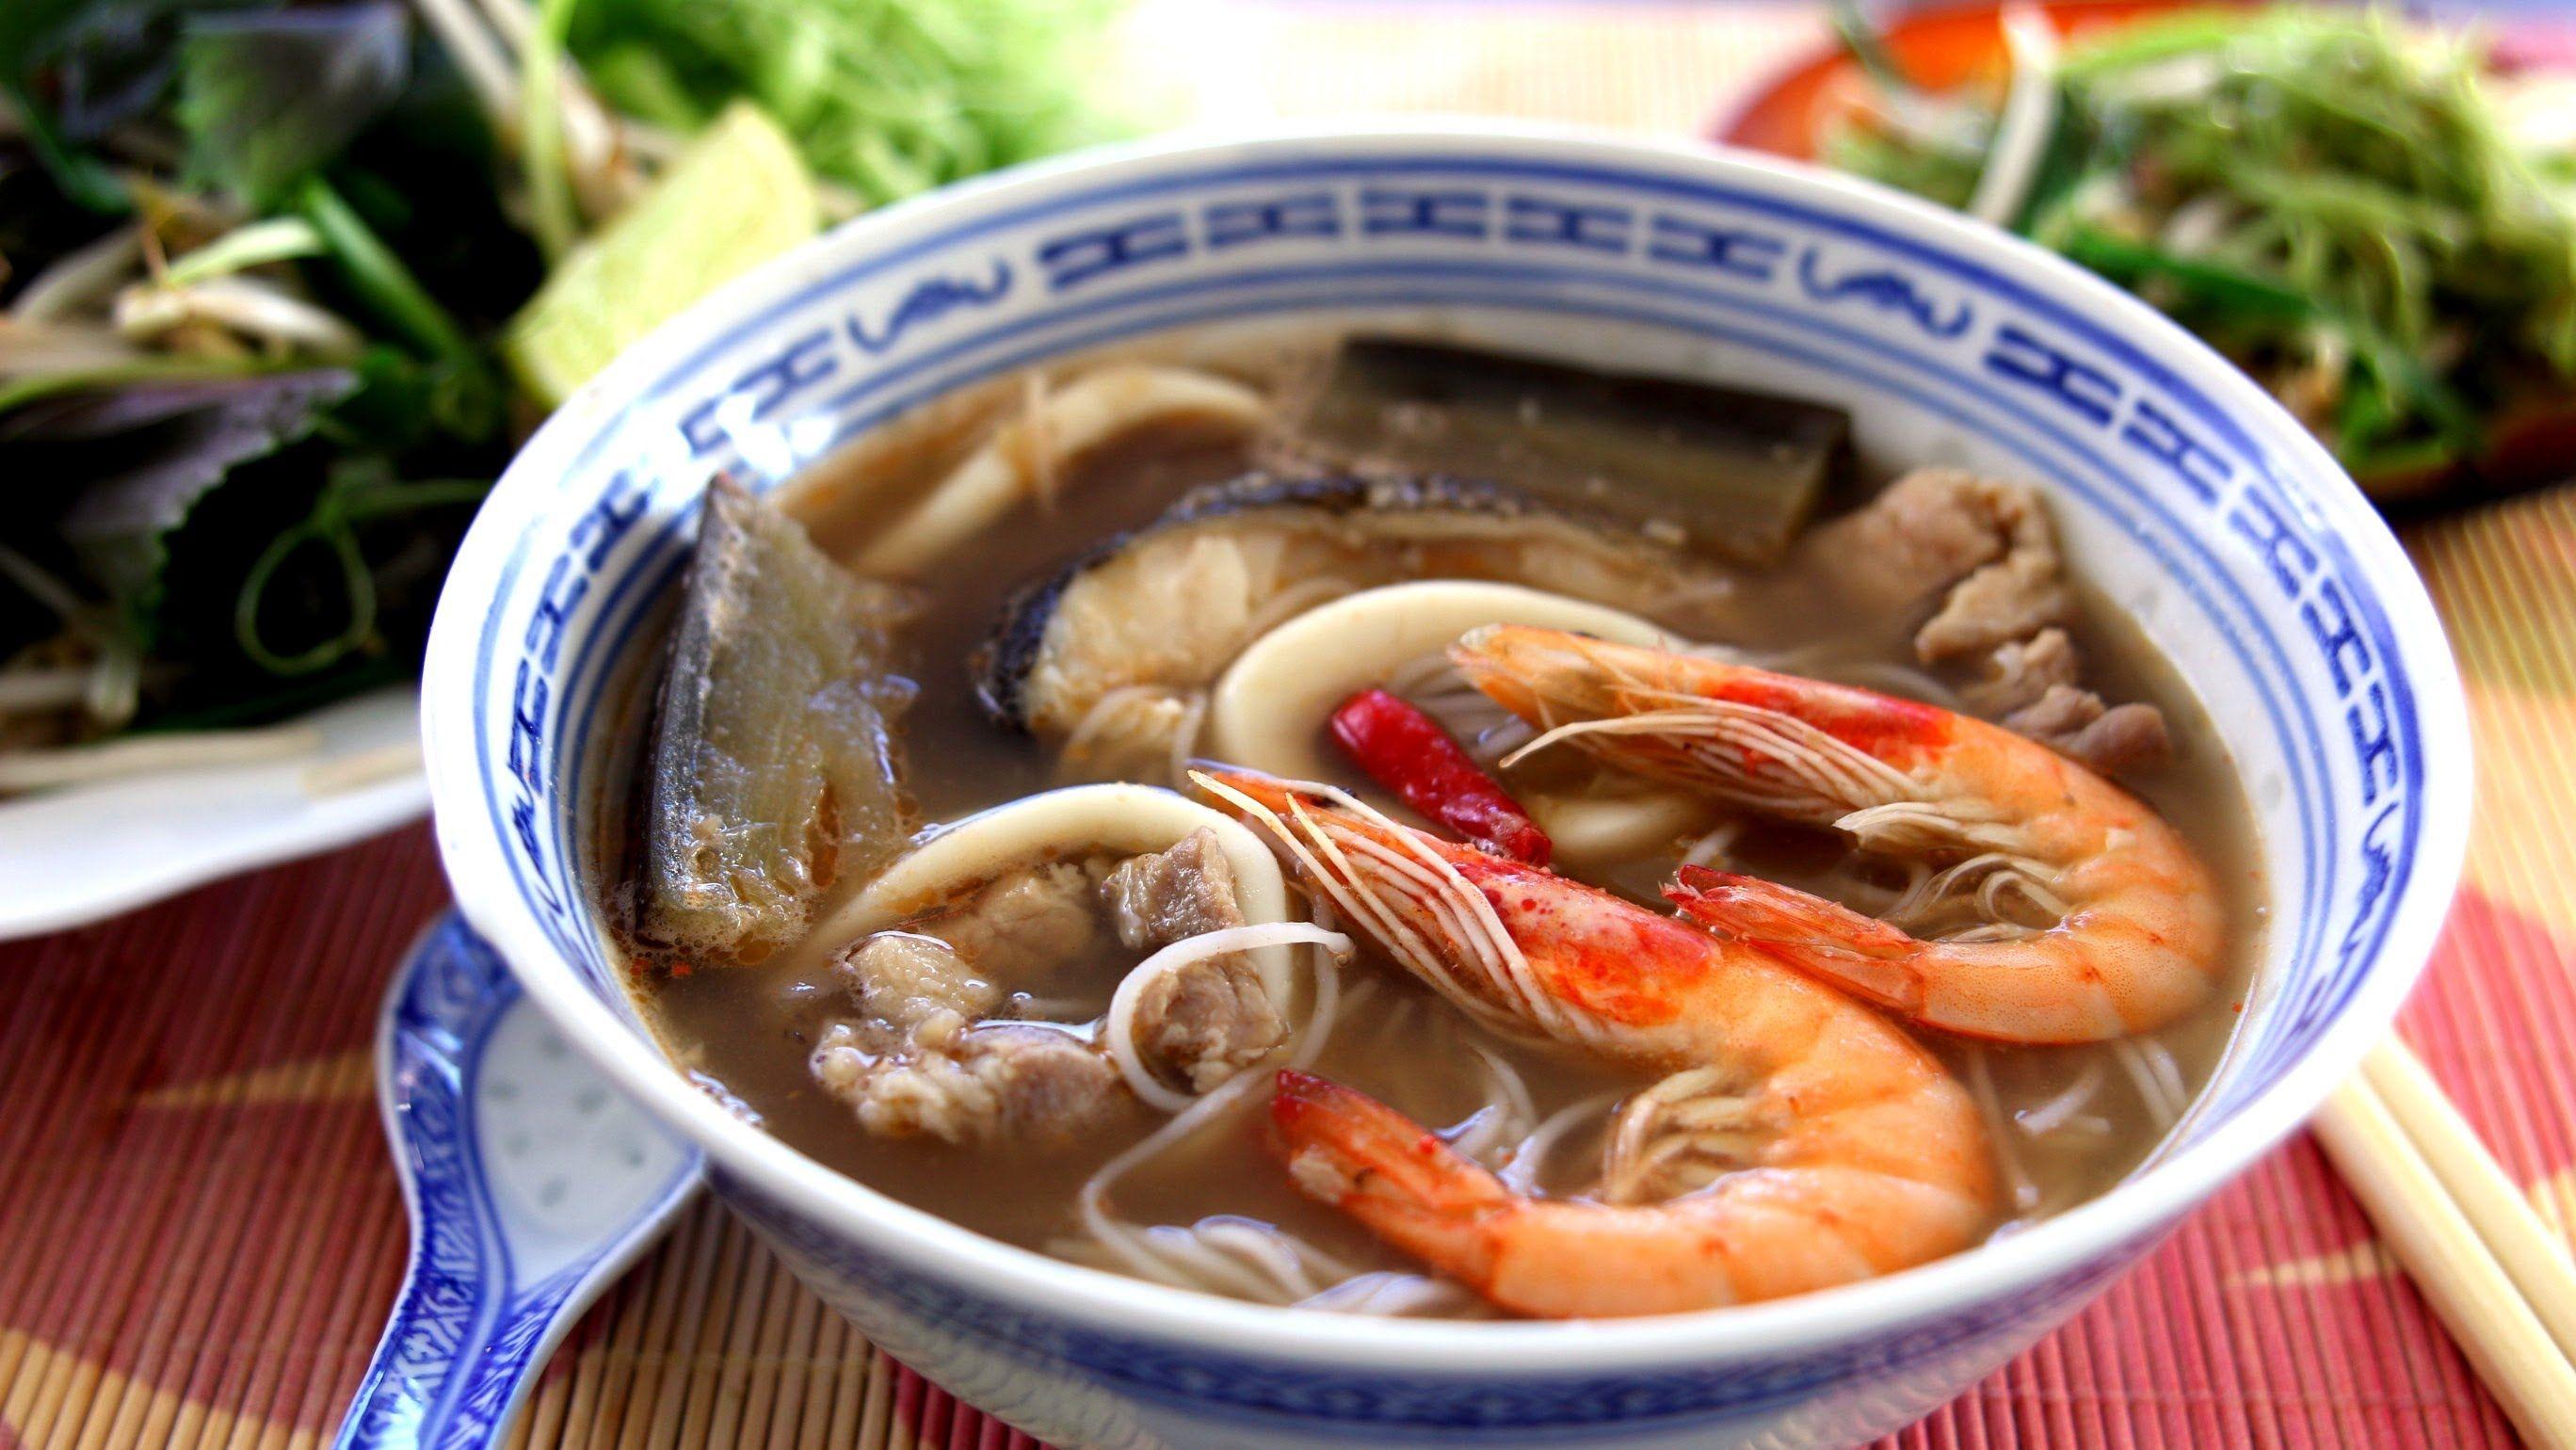 Bun Mam - Vietnamese Seafood Gumbo Recipe | FOOD - I left ...